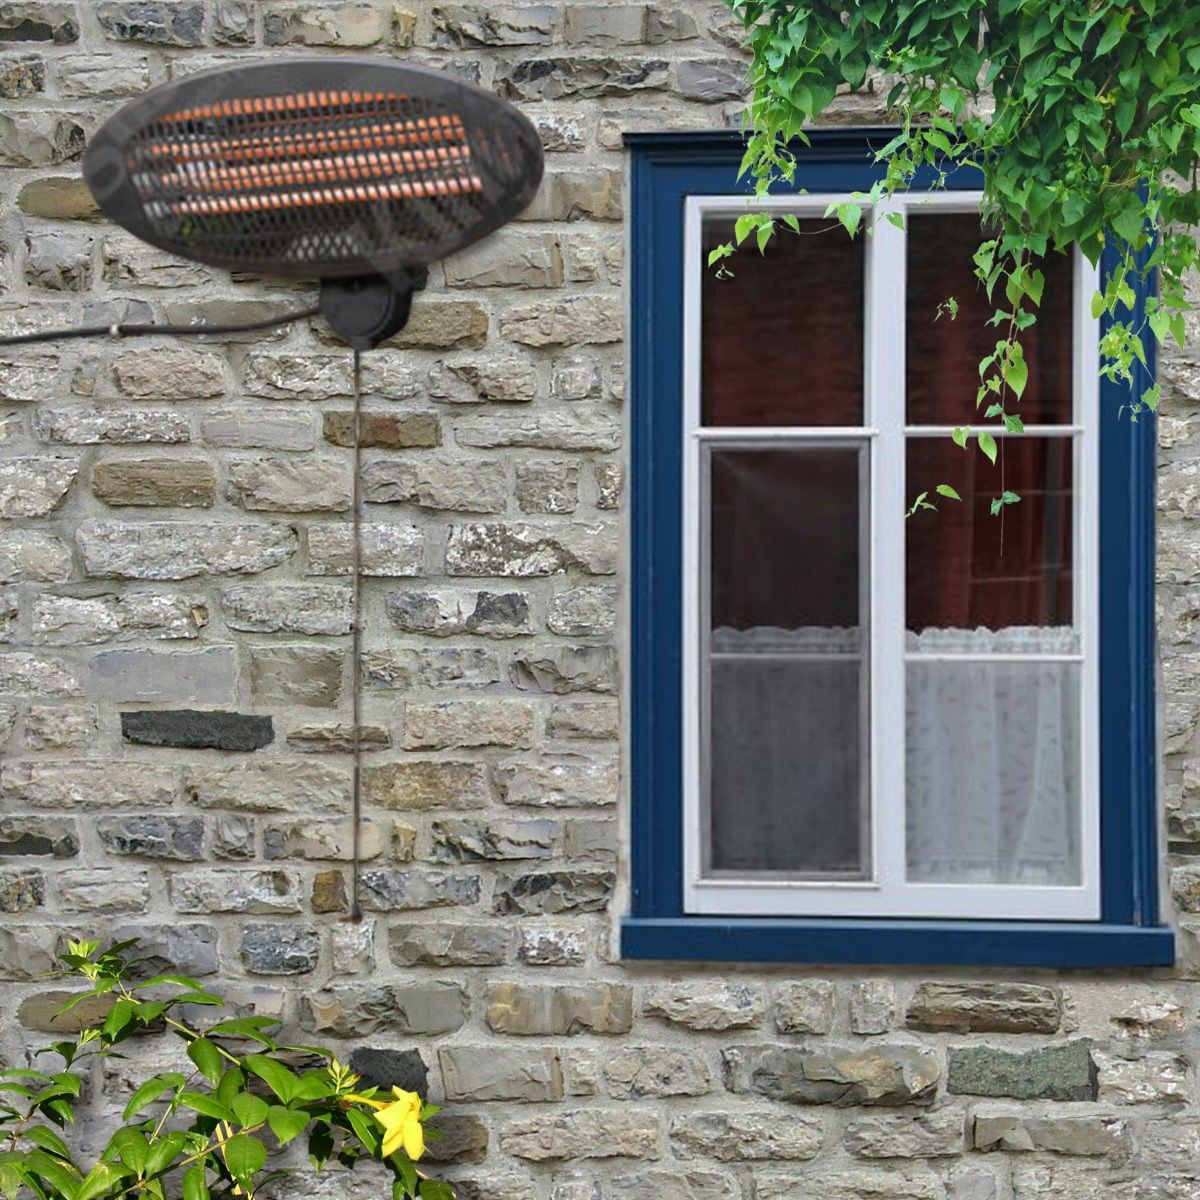 Costway Electric Patio Heater Wall Mounted Infra Outdoor Waterproof